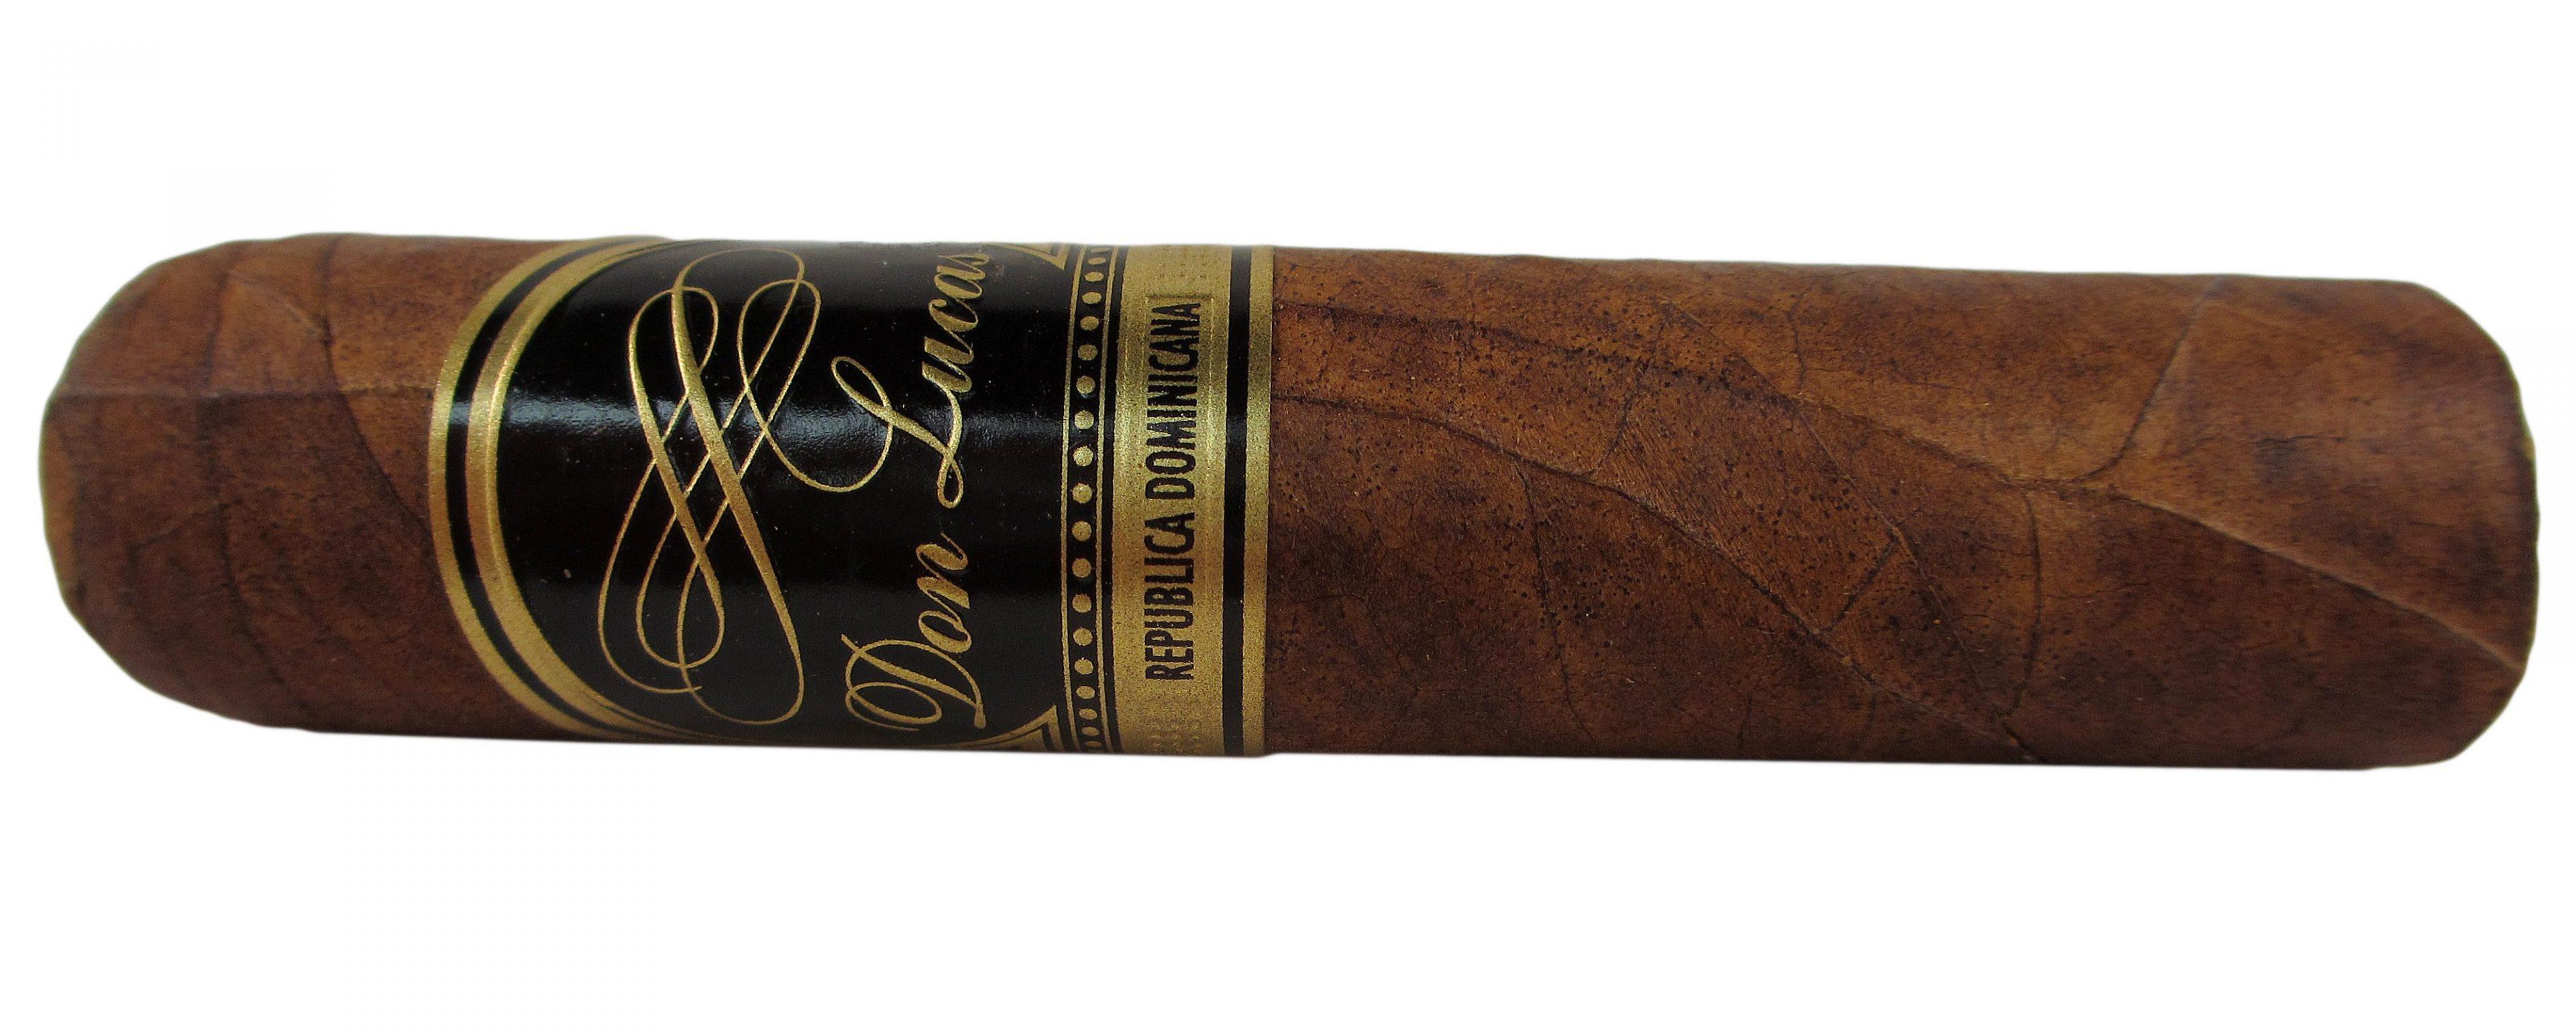 Blind Cigar Review: Don Lucas   A.L. Series Short Toro